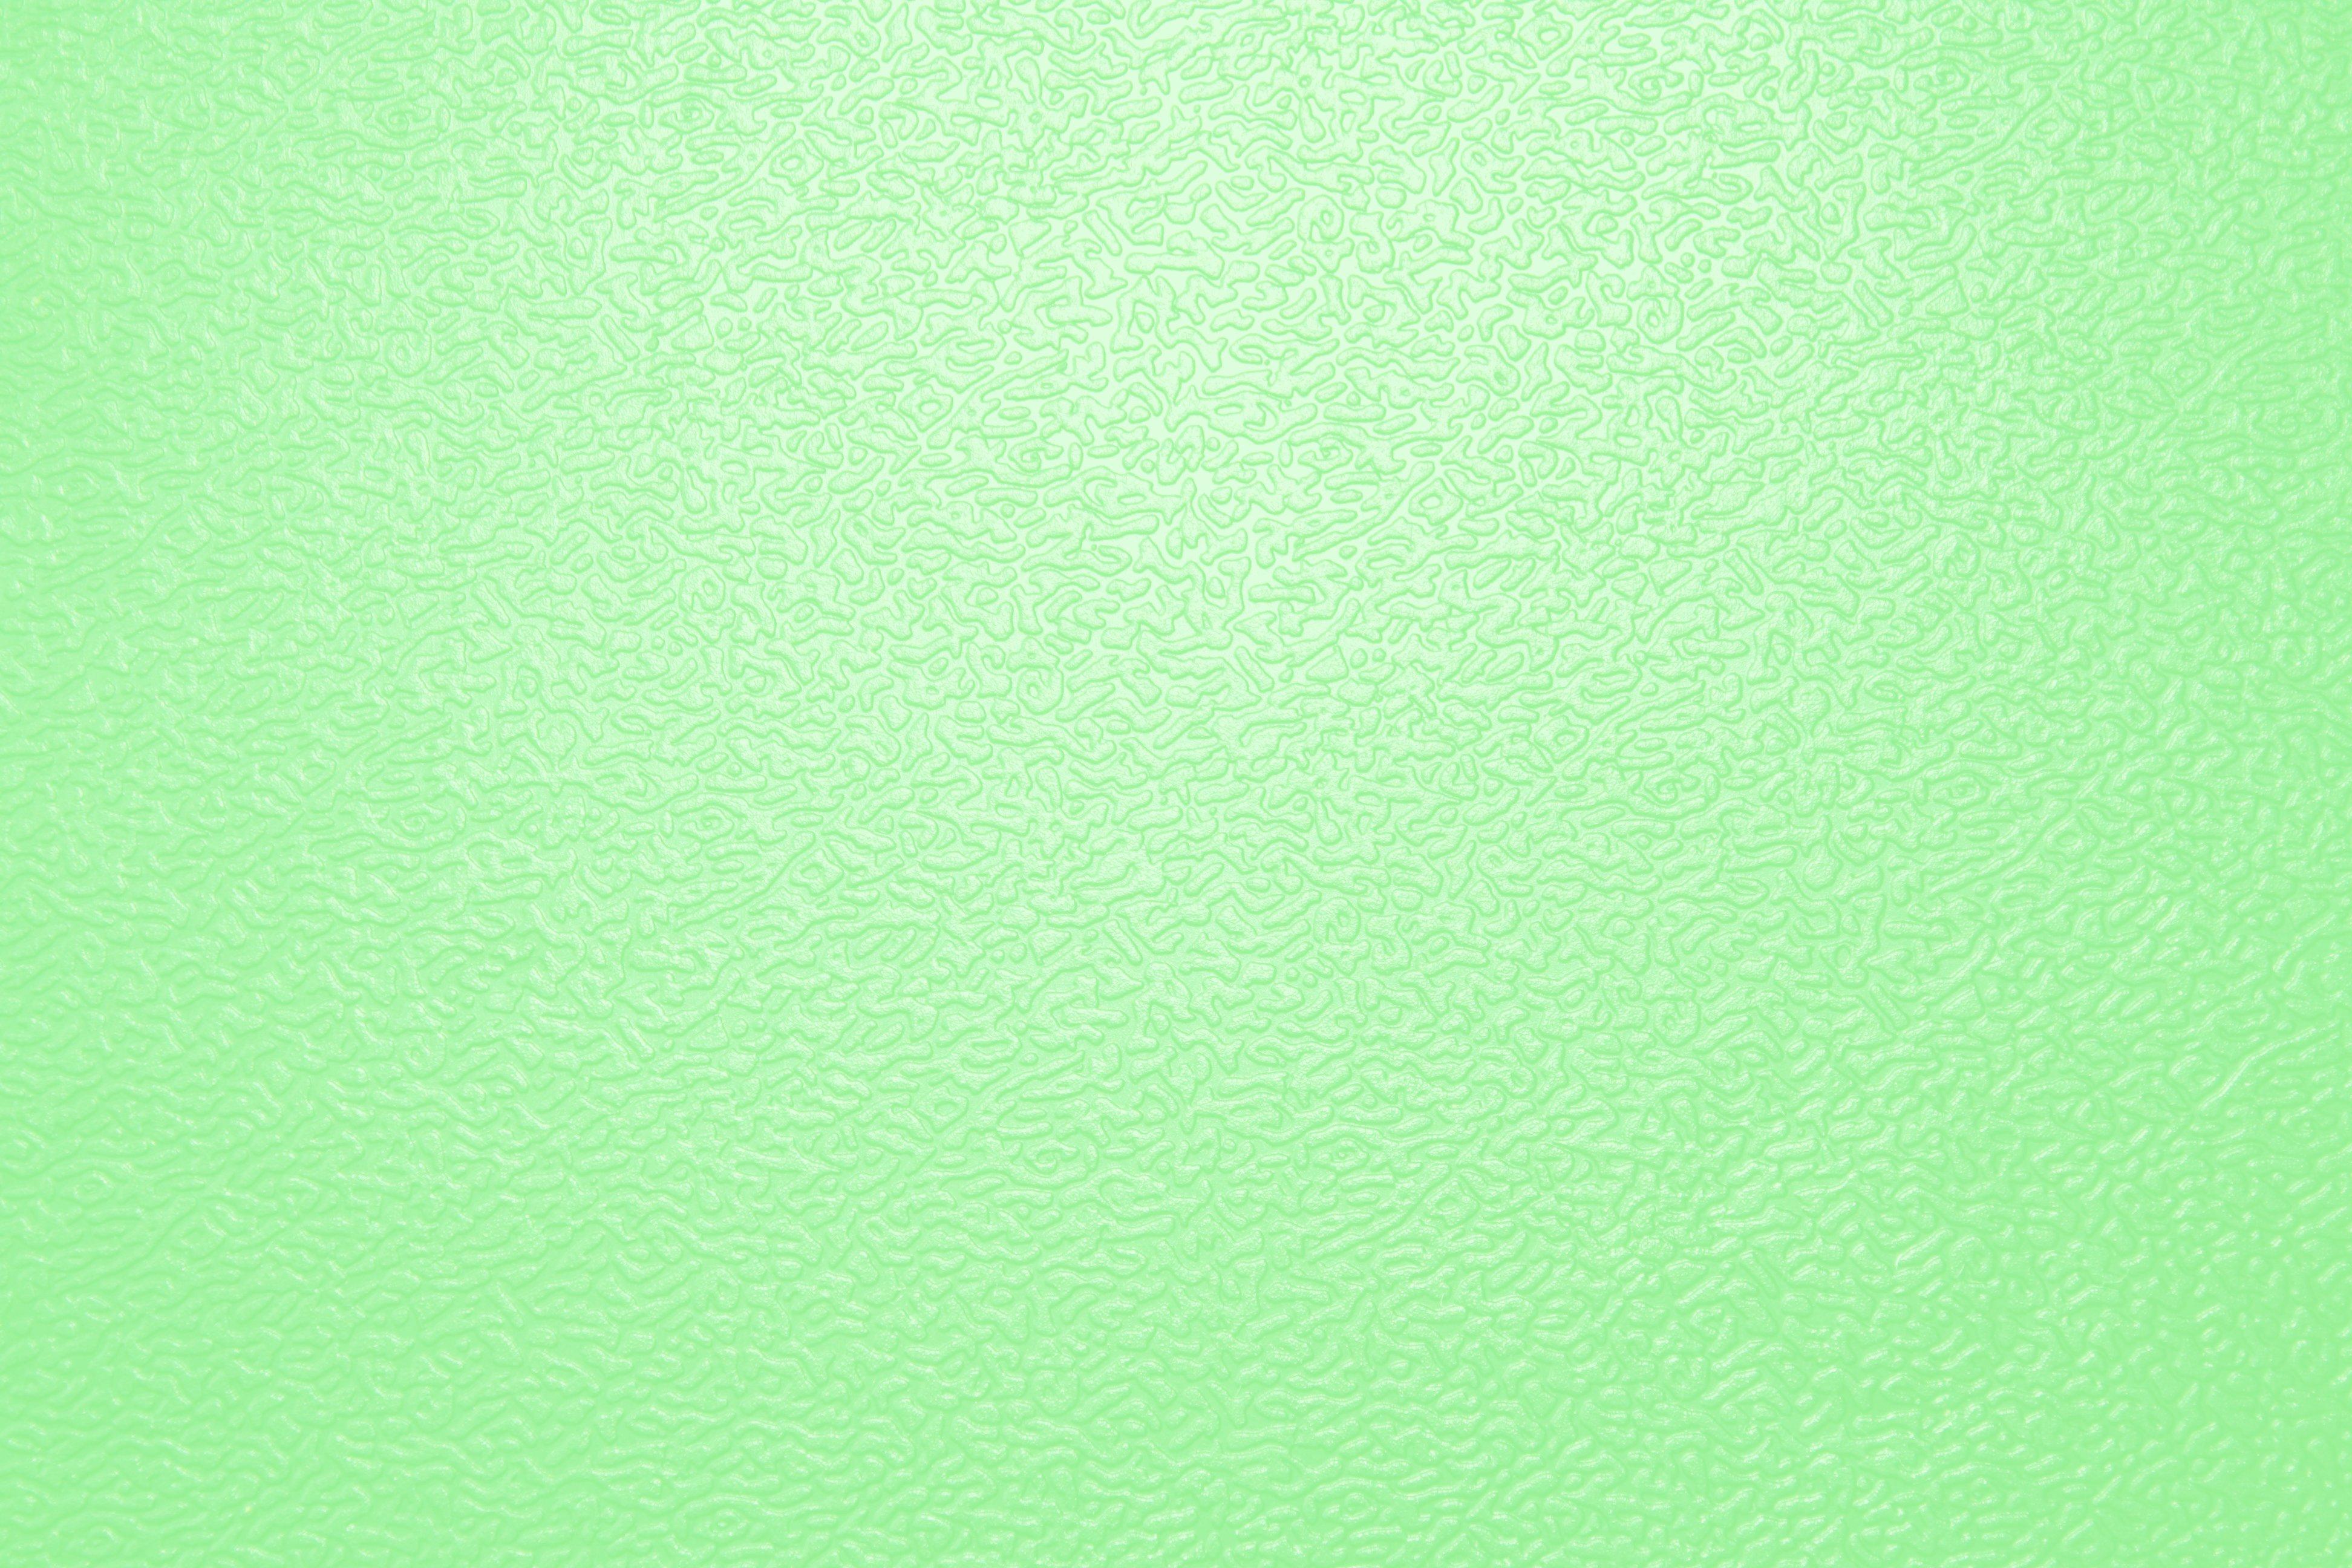 Textured Light Green Plastic Close Up   High Resolution Photo 3888x2592